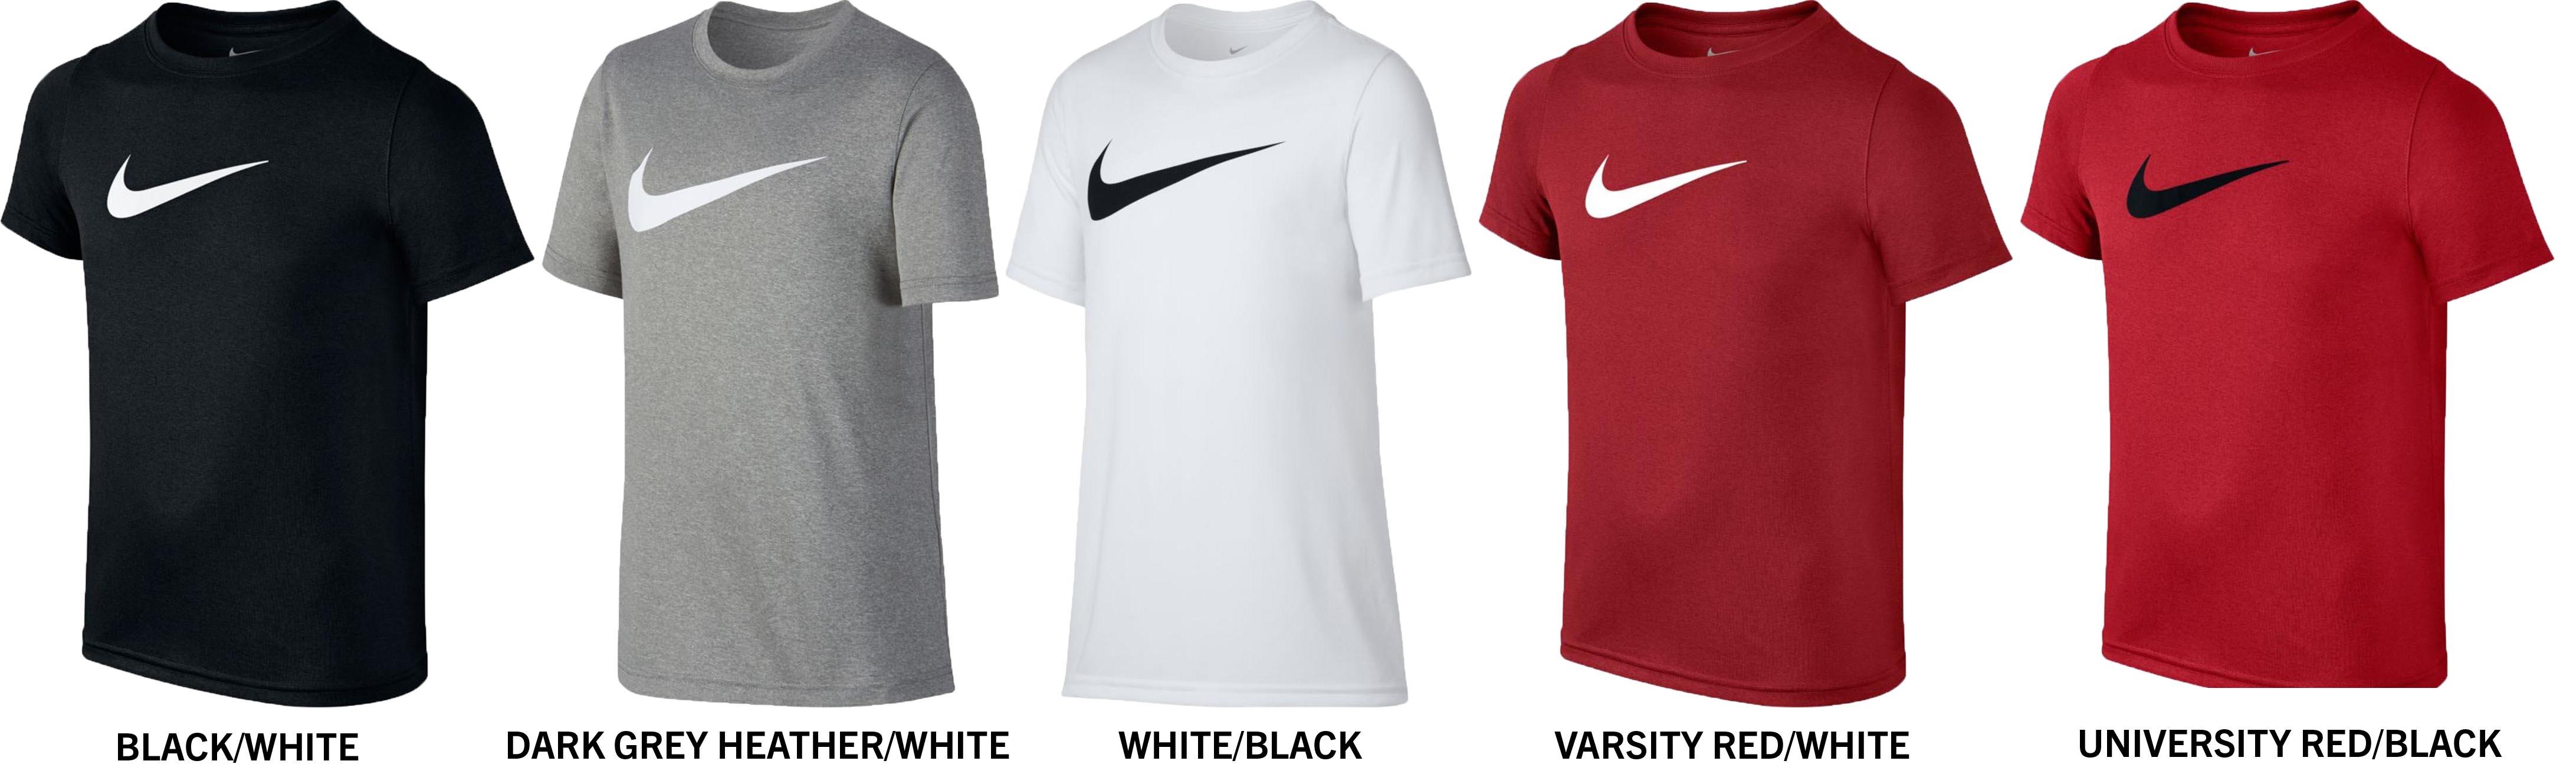 cd1d05fb8b98cb Nike Dri-FIT Boy s Short Sleeve Training T-Shirt